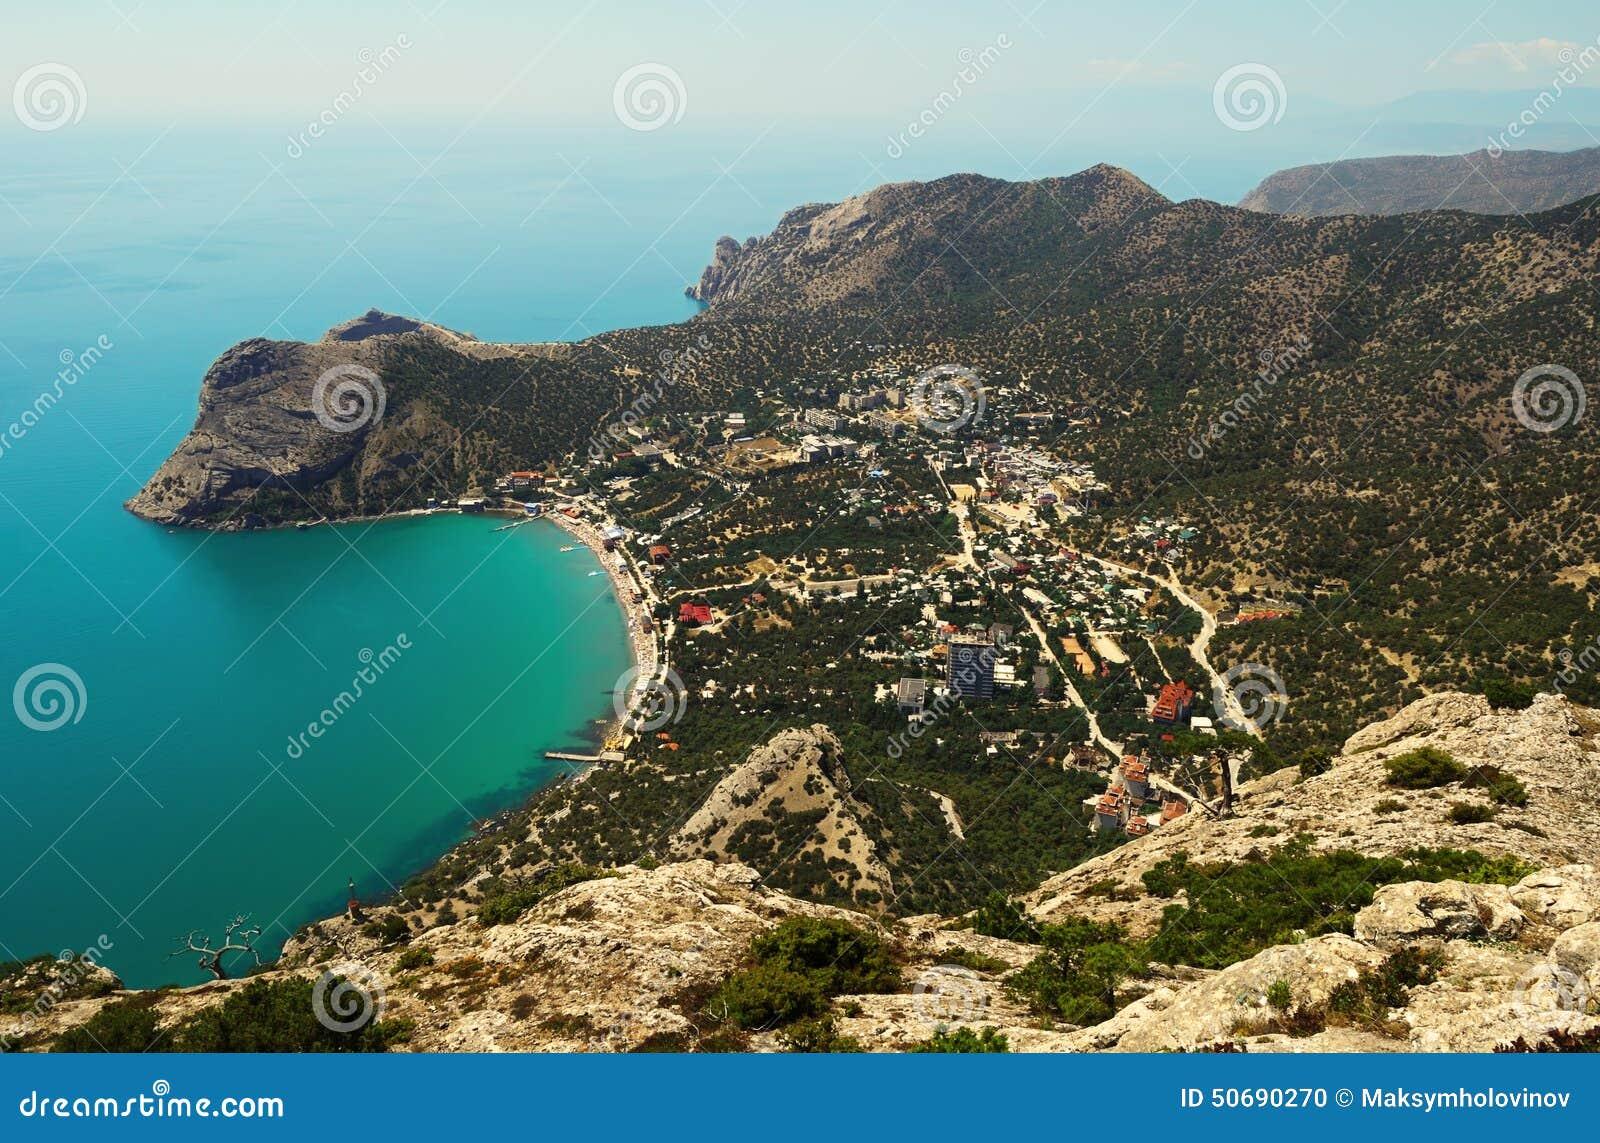 Download 美丽的横向山 库存照片. 图片 包括有 绿色, 克里米亚, 粗砺, 场面, 没人, 陆岬, 杉木, 横向 - 50690270